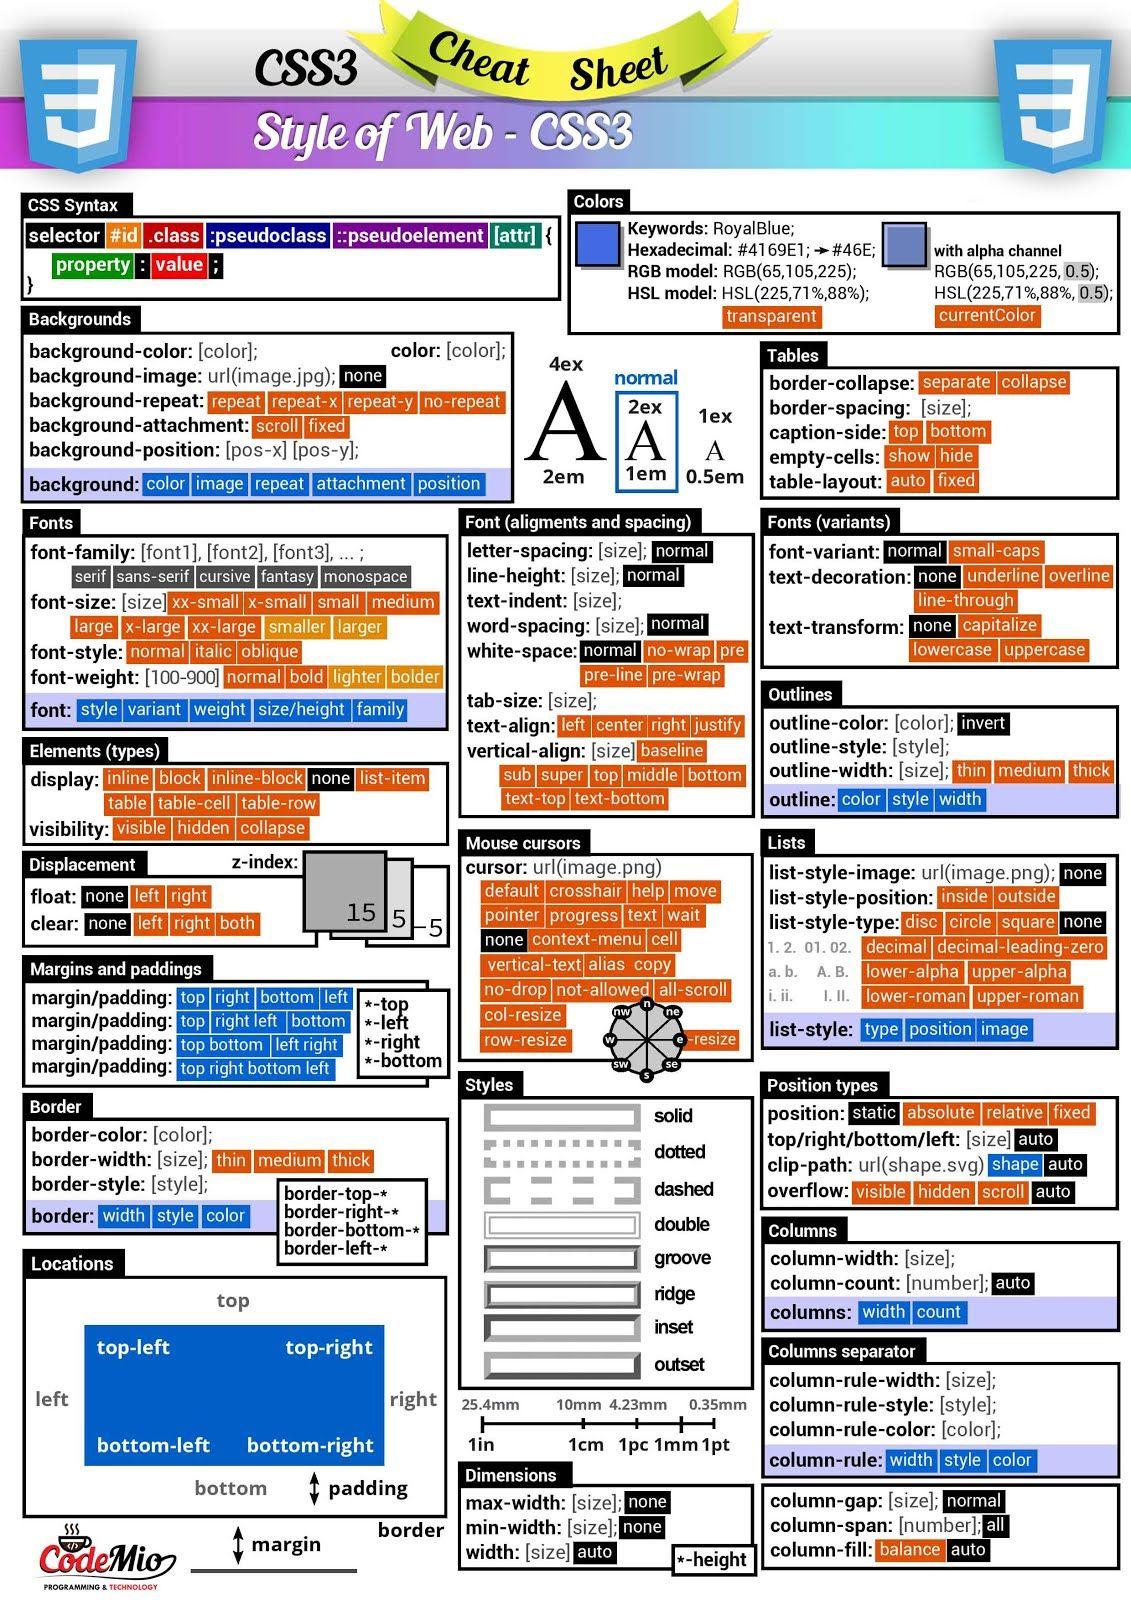 Useful Html5 Css3 Javascript Cheat Sheets Hd Codemio Programming And Web Development Programming Javascript Cheat Sheet Web Development Design